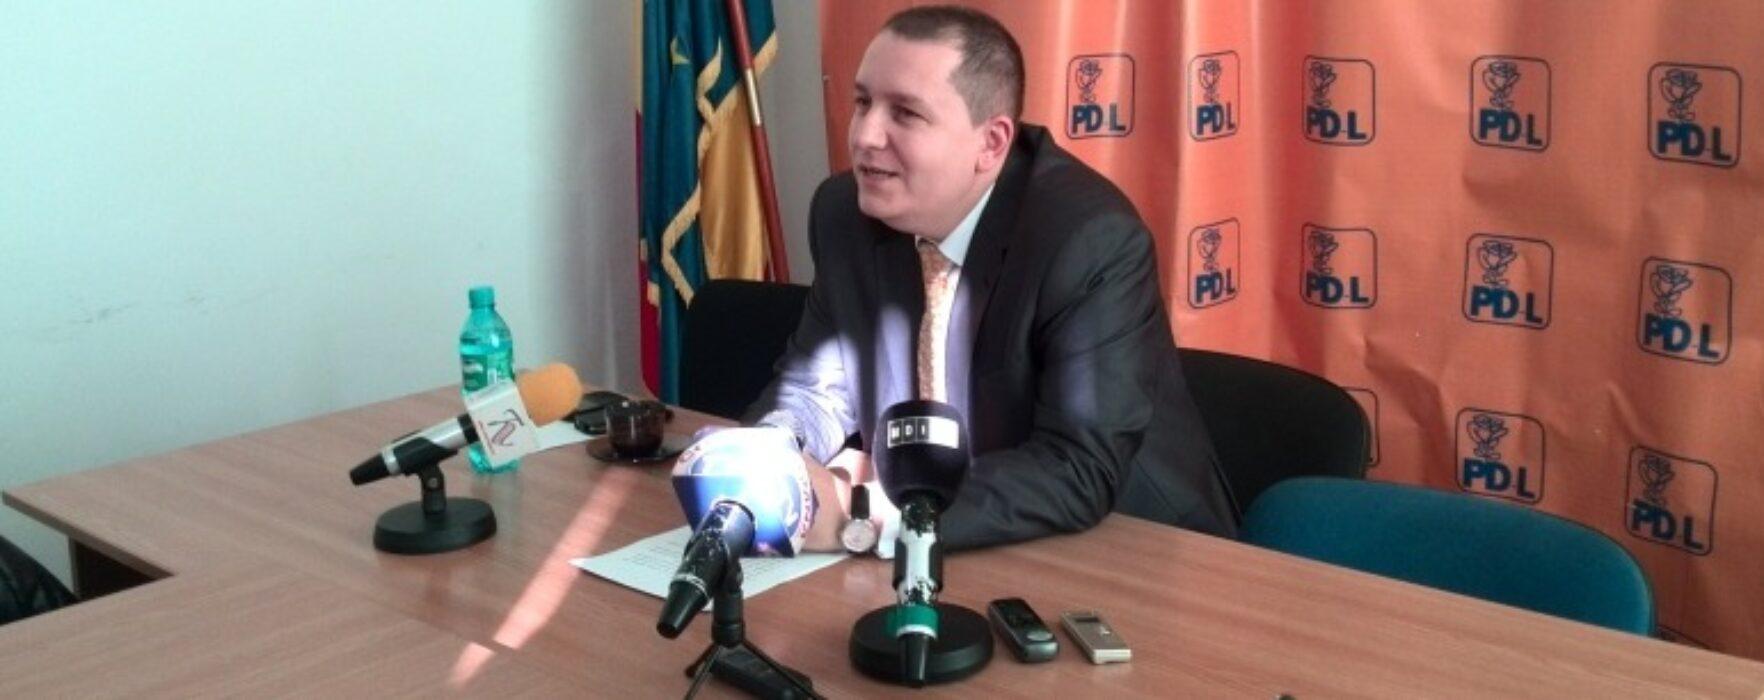 PNL Dâmboviţa: Claudiu Dumitrescu va fi exclus din partid